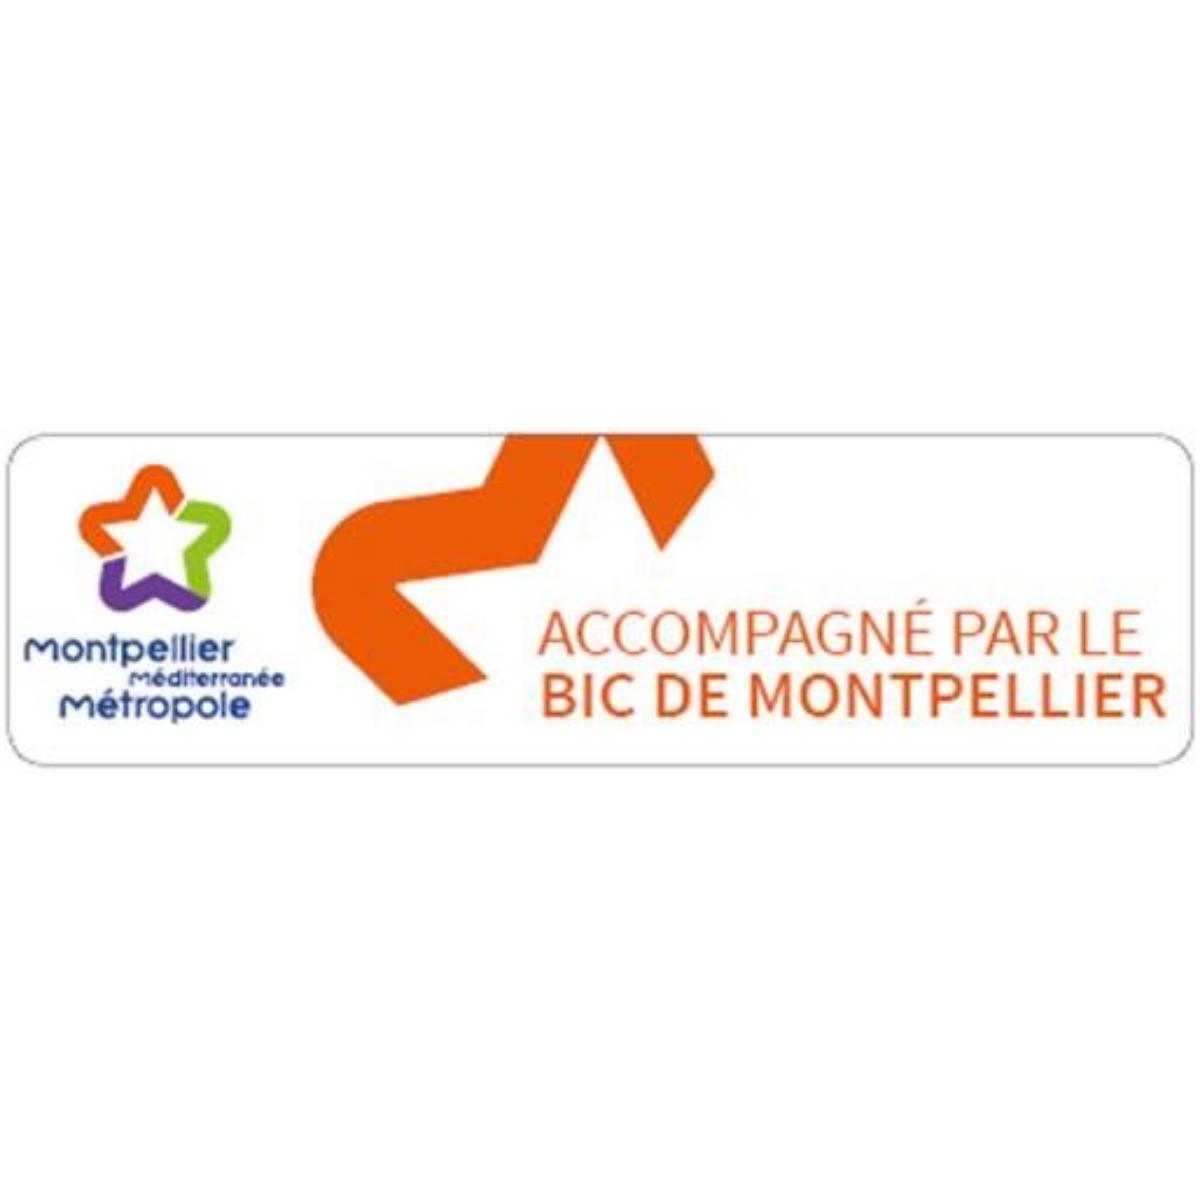 Deepbloo - BIC de Montpellier partnership in energy sector